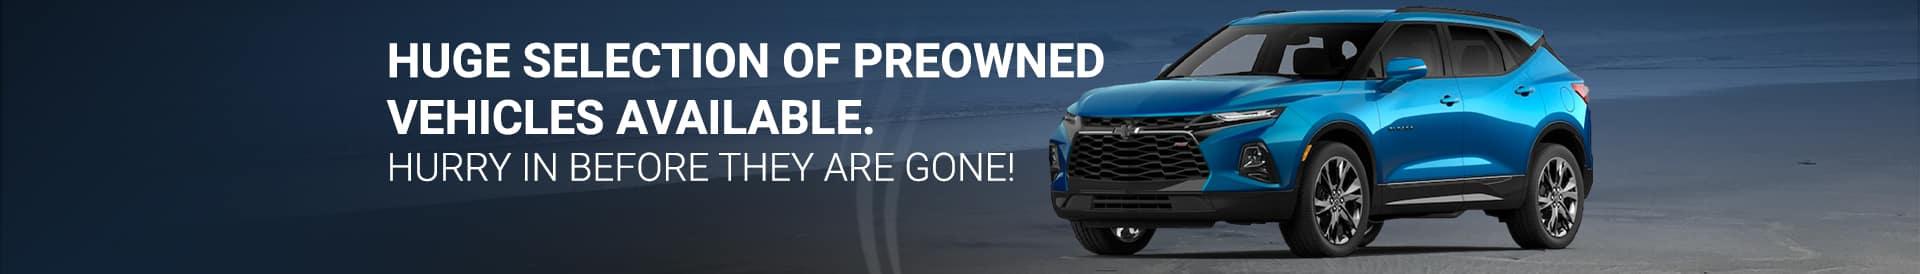 Get a great used car deal at Coastal!